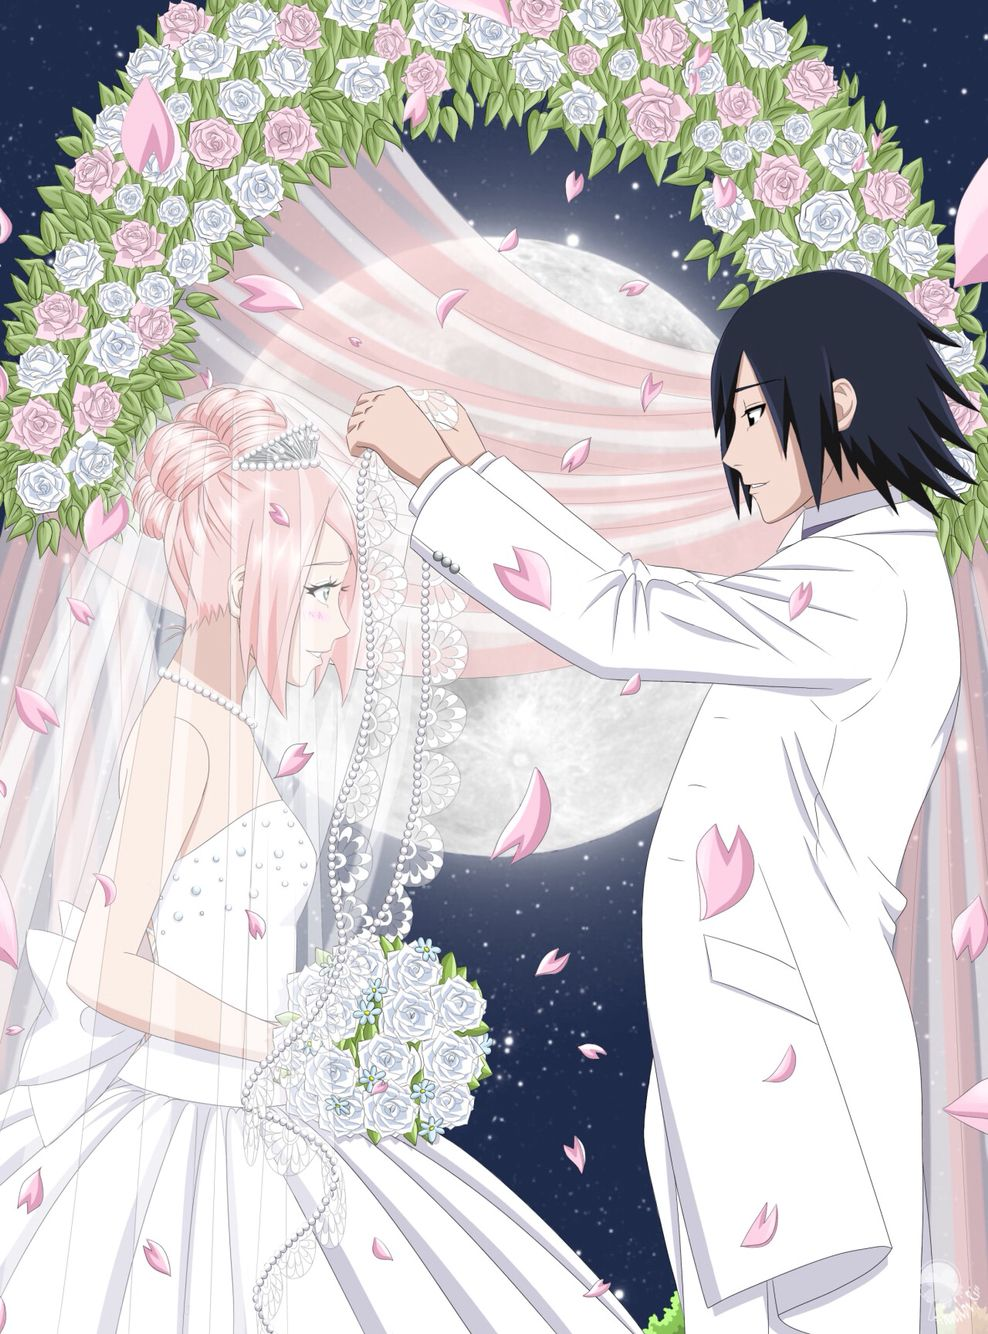 Картинки свадьбы сакуры и саске